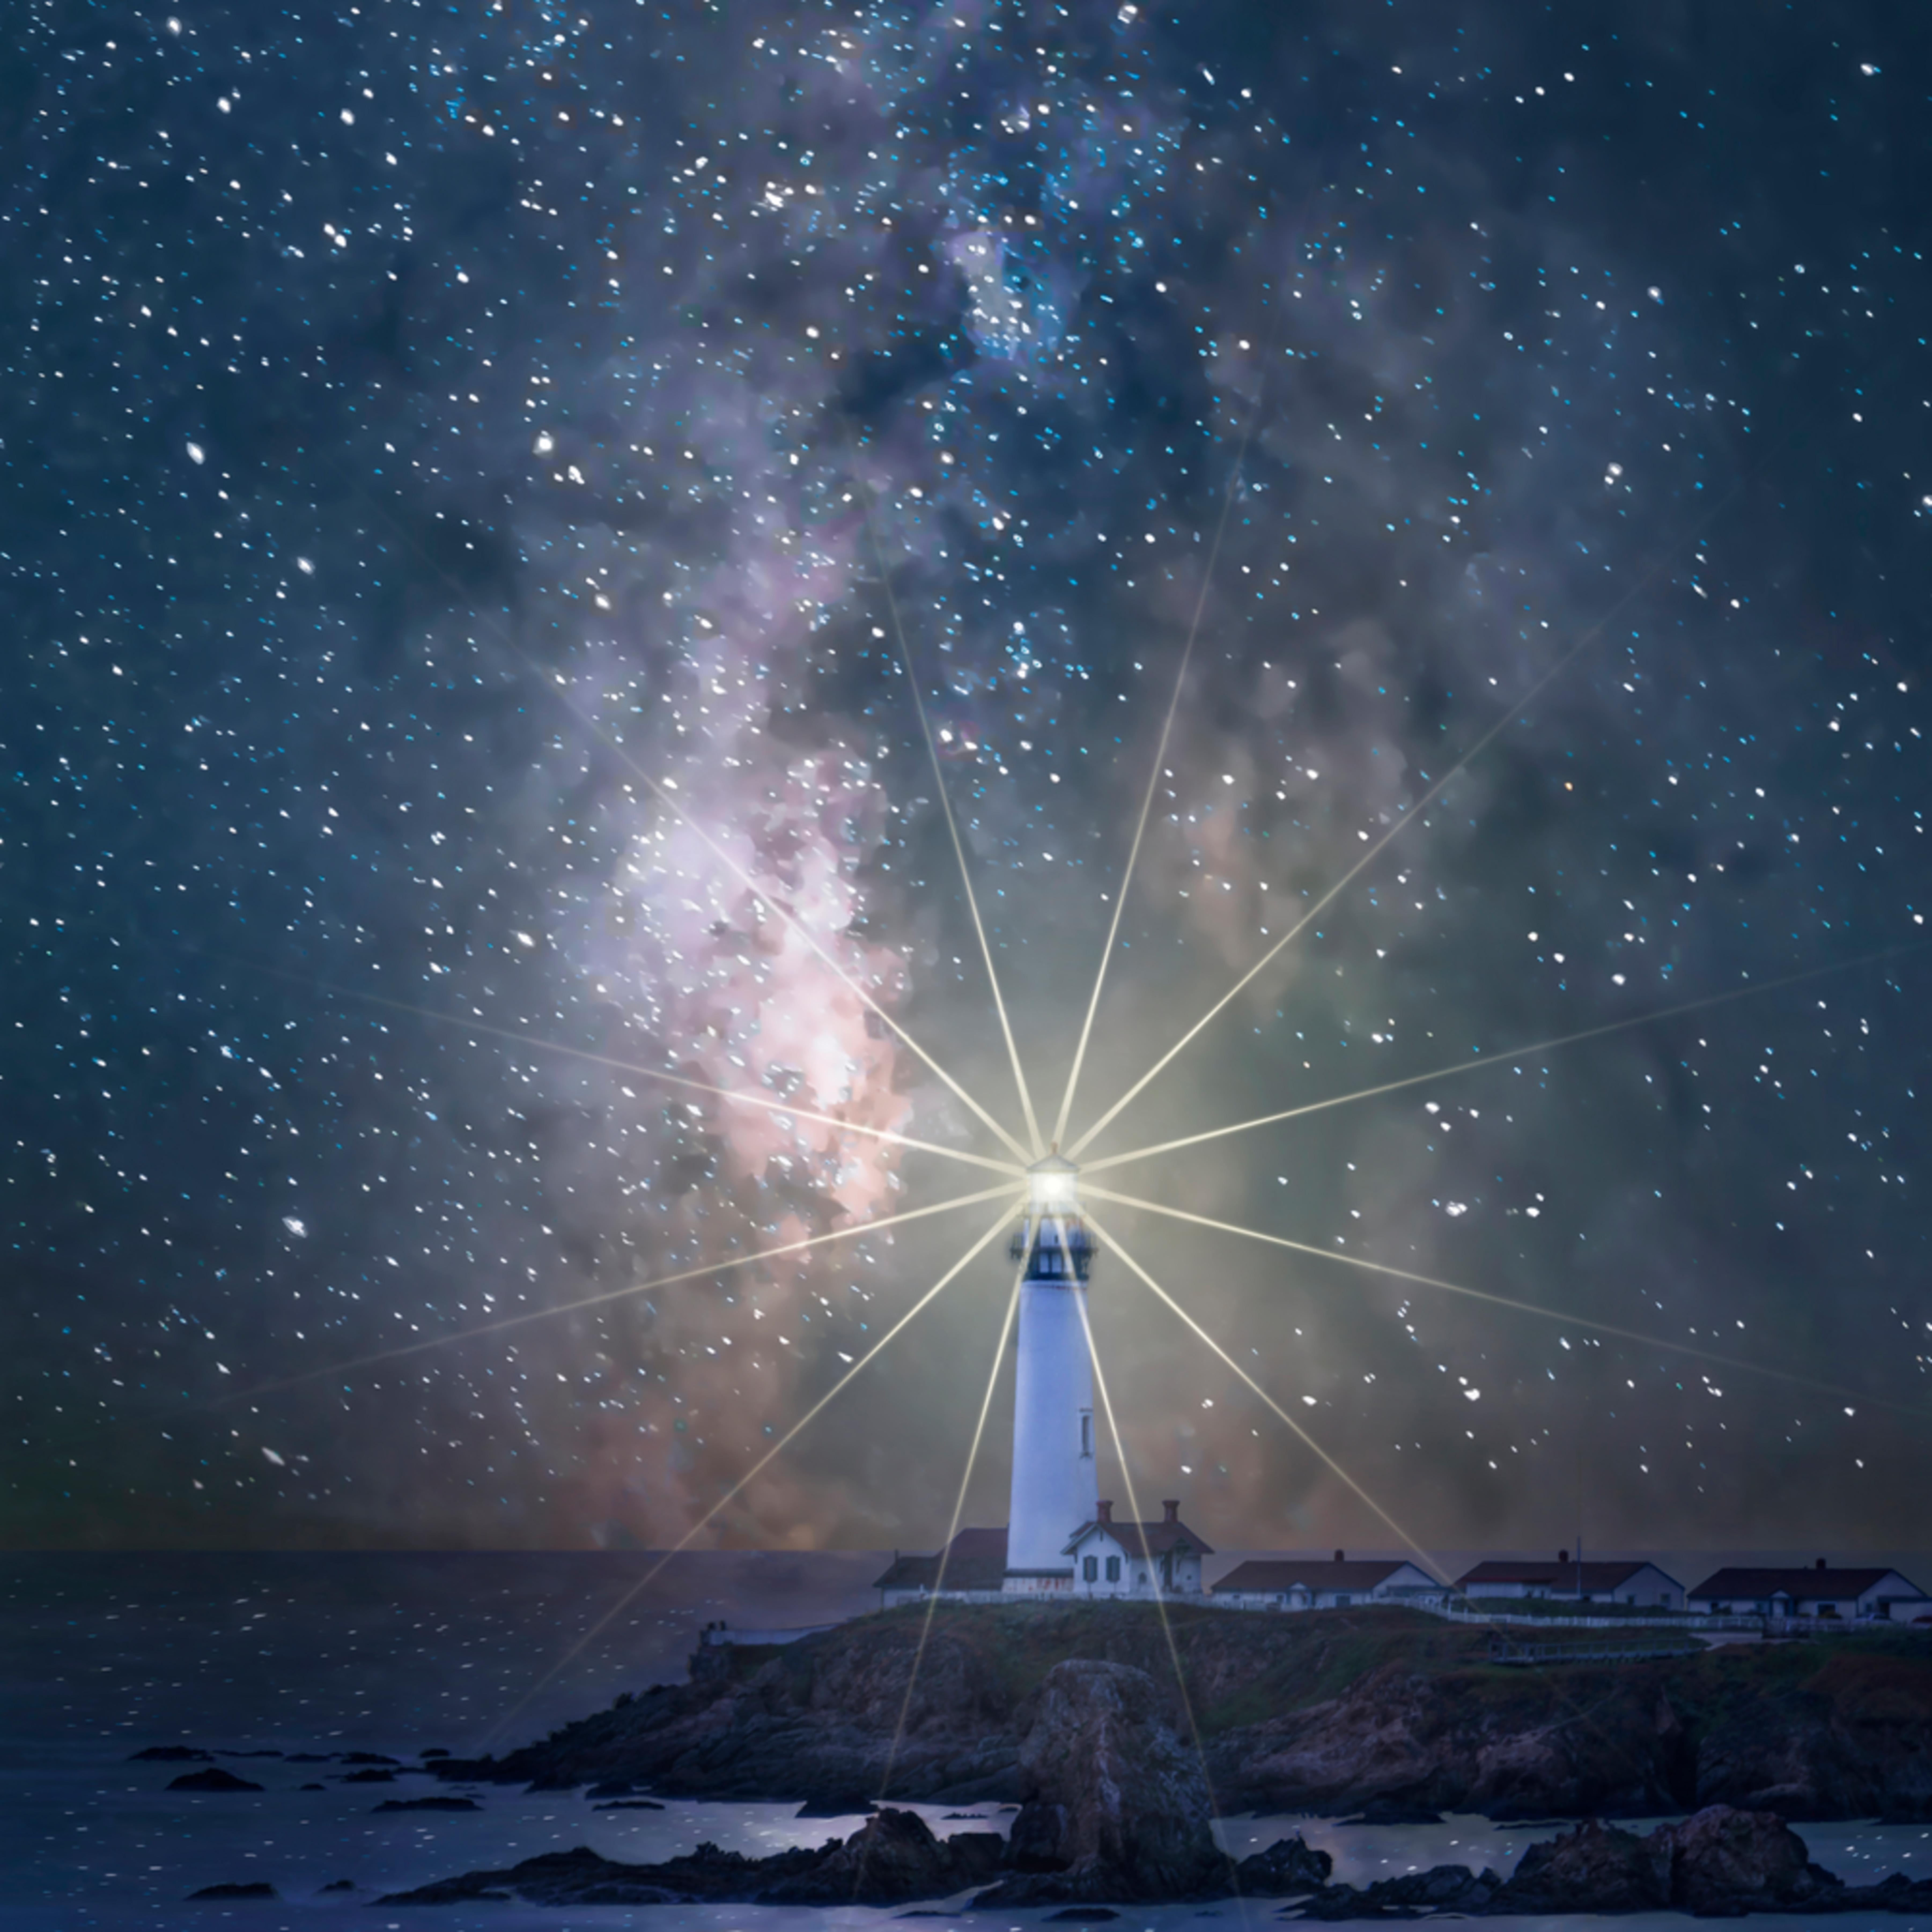 Dreaming light asf lseeto